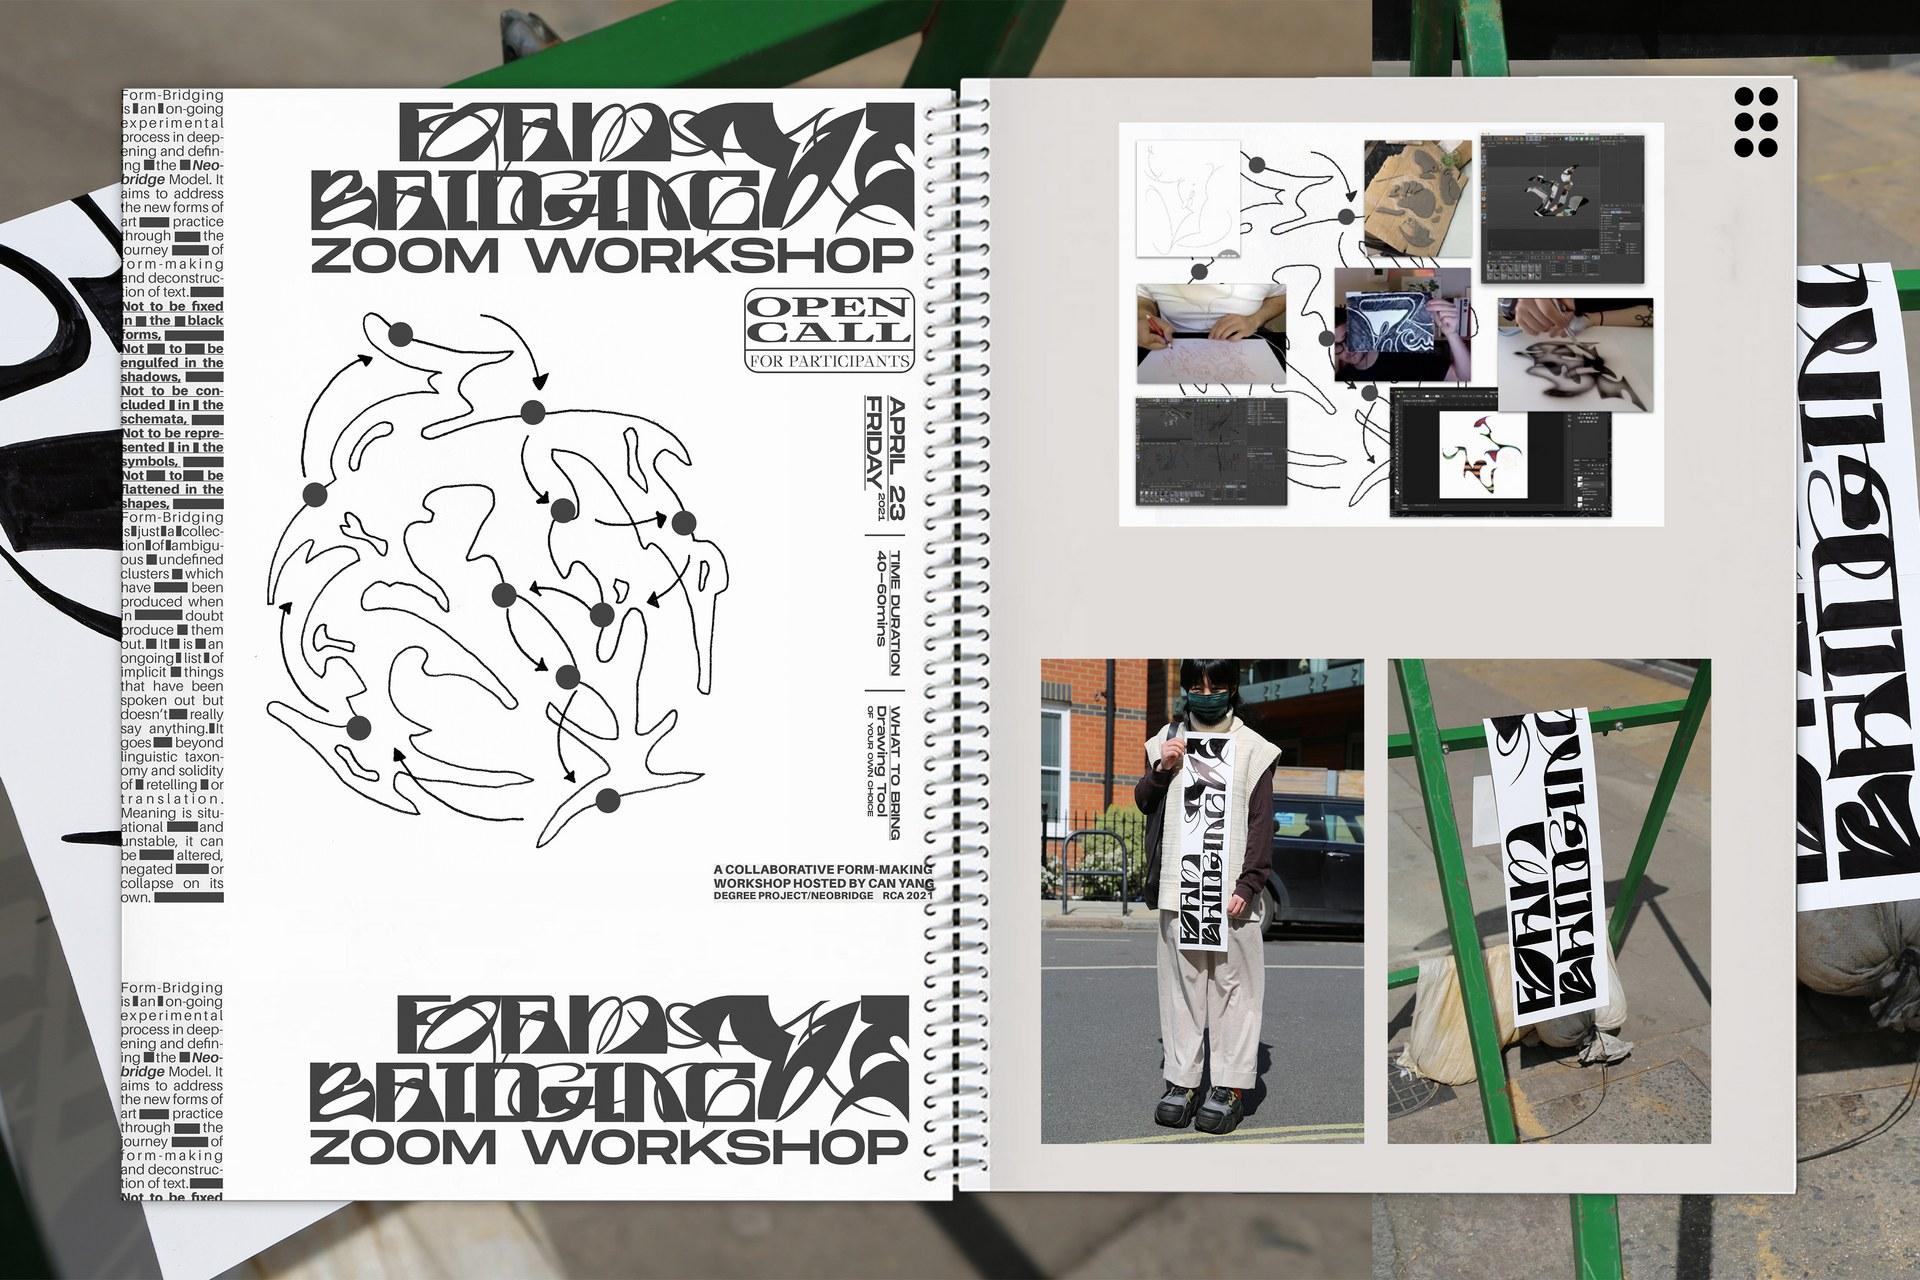 Form-bridging collaborative Workshop 01.jpg